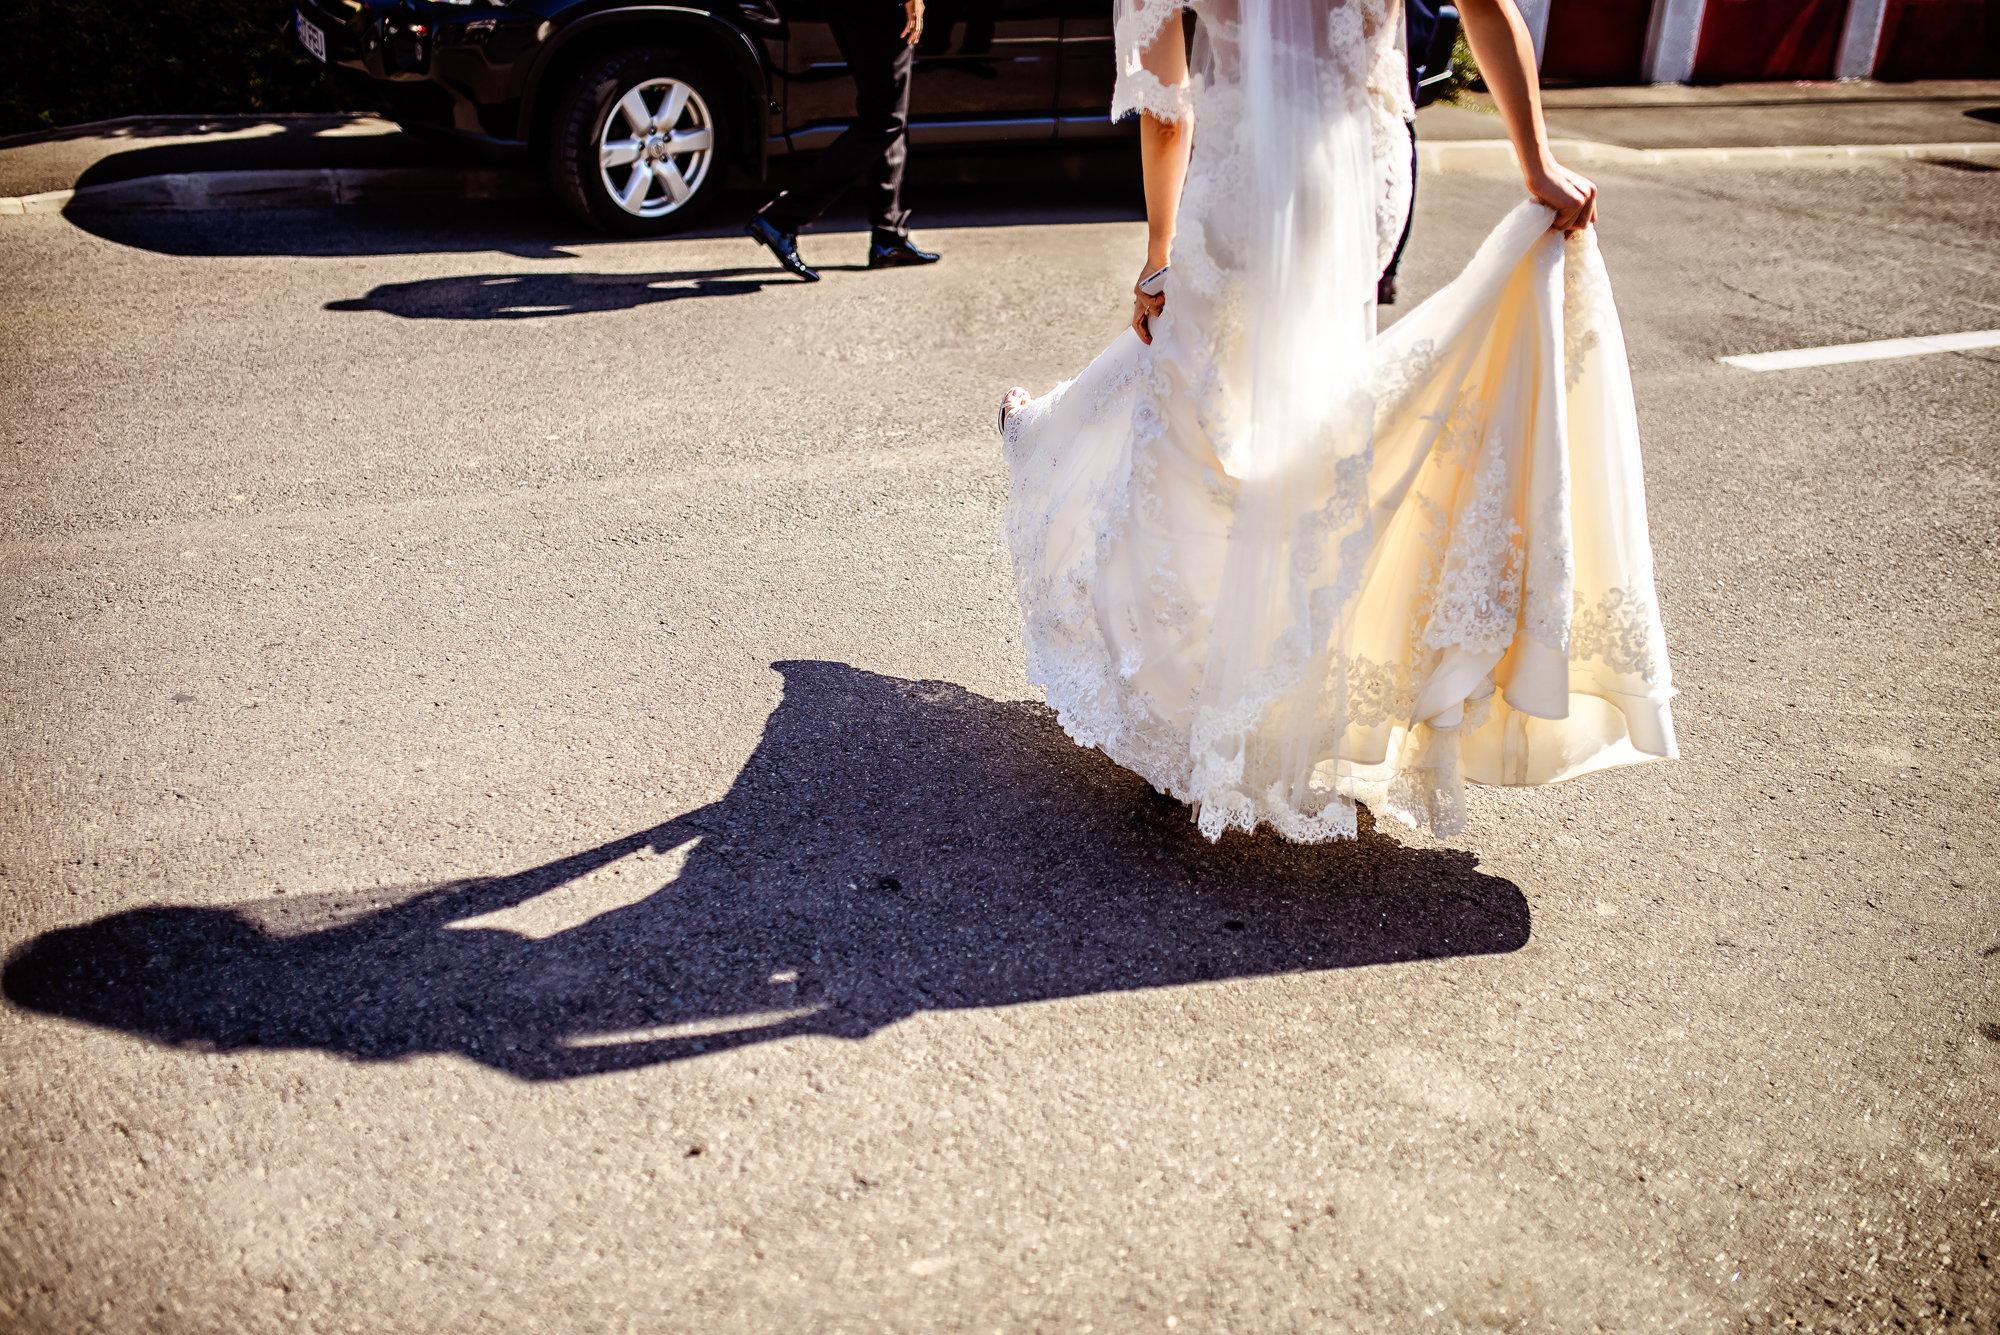 alexandru madalina wedding day 11 1